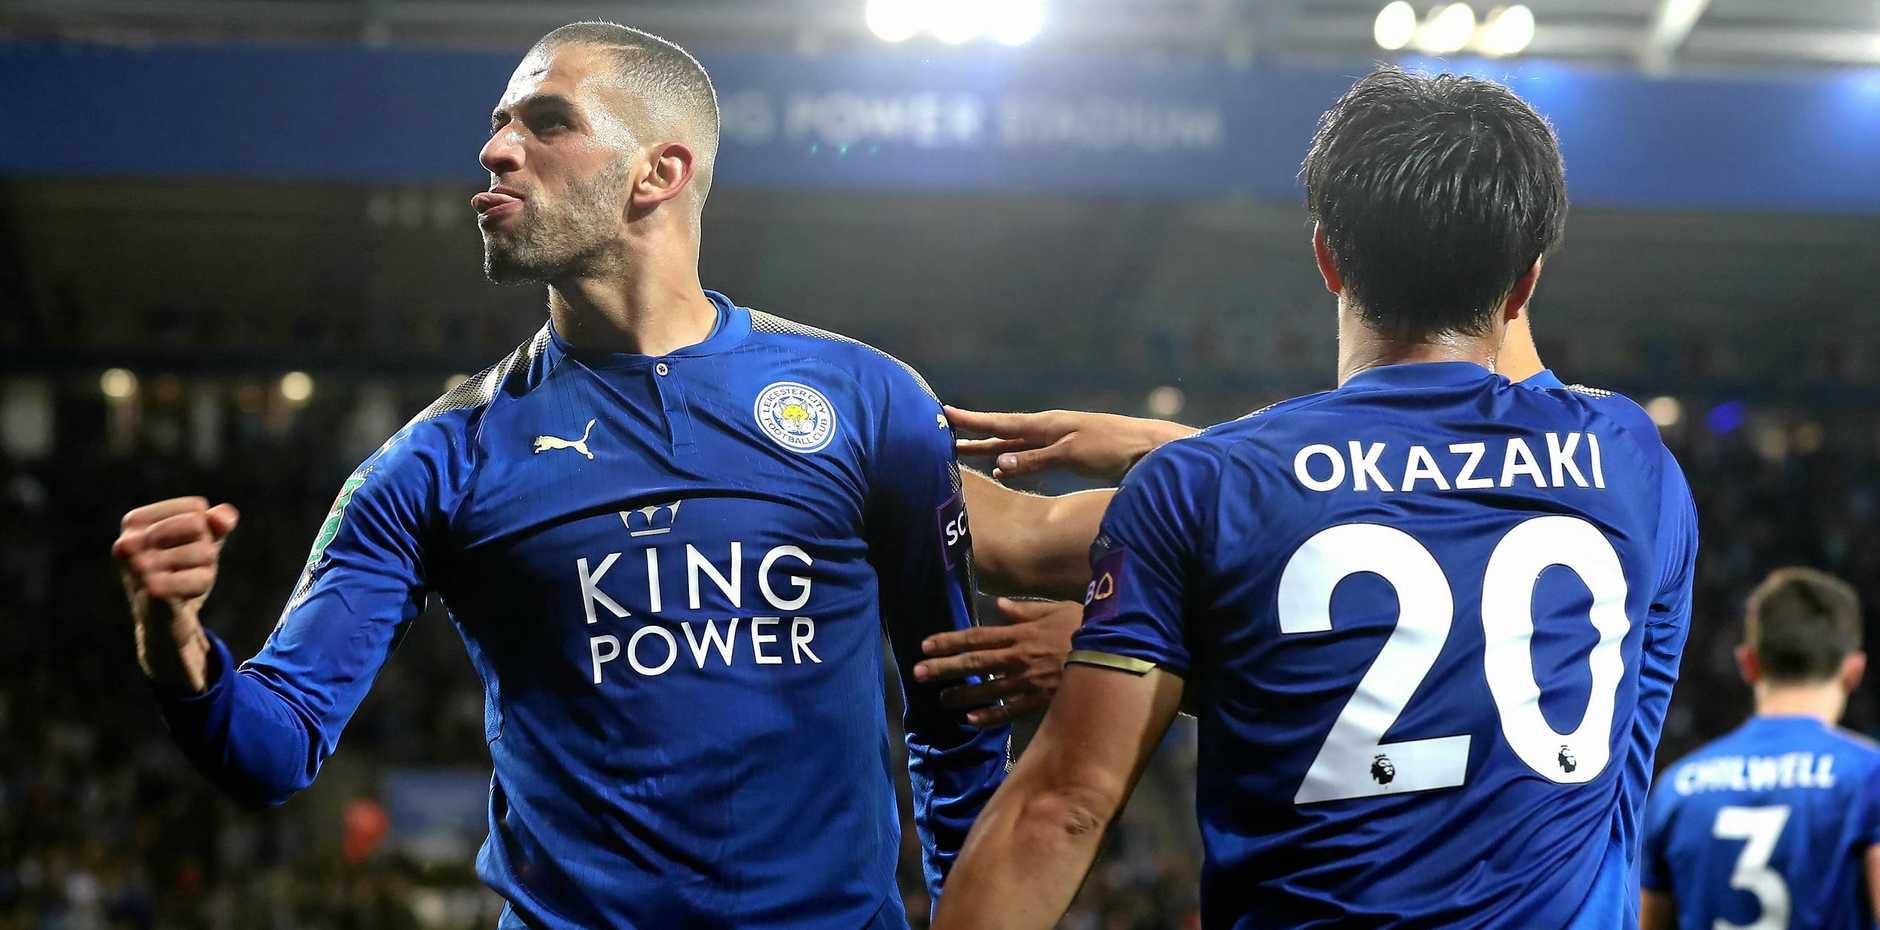 Islam Slimani of Leicester City celebrates scoring his side's second goal with Shinji Okazaki against Liverpool.